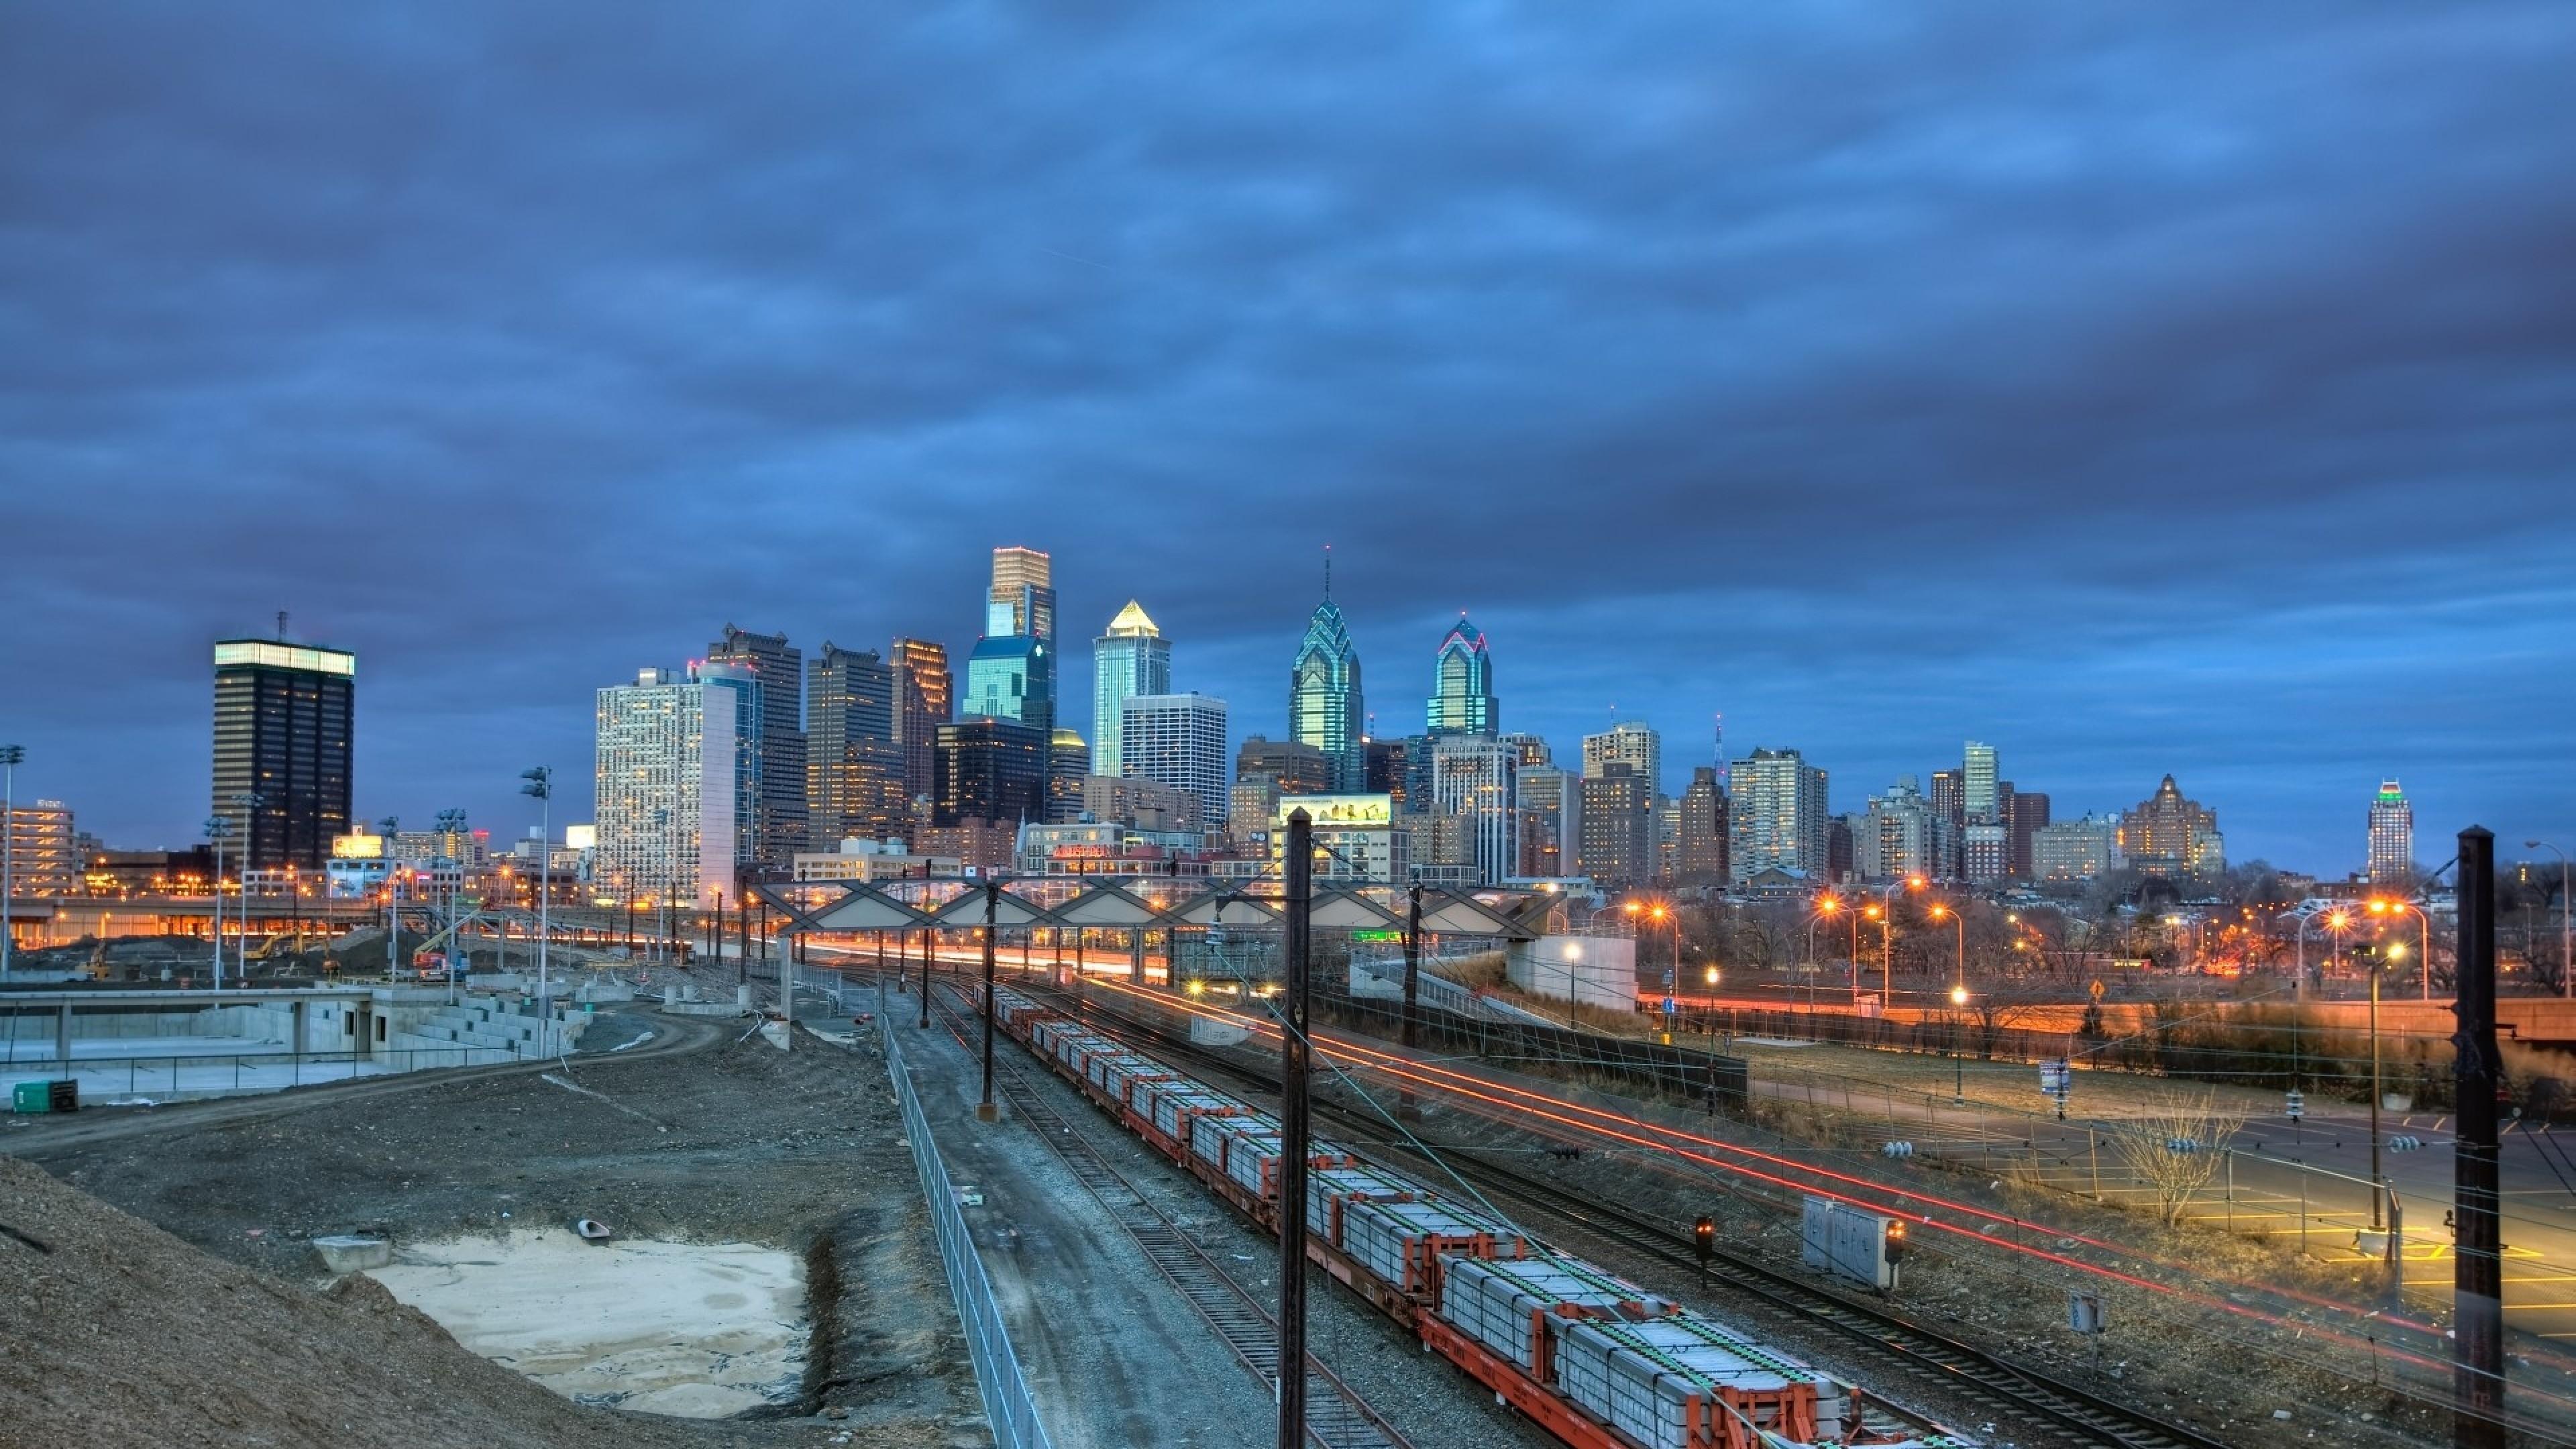 Preview wallpaper philadelphia, railway, building, city 3840×2160